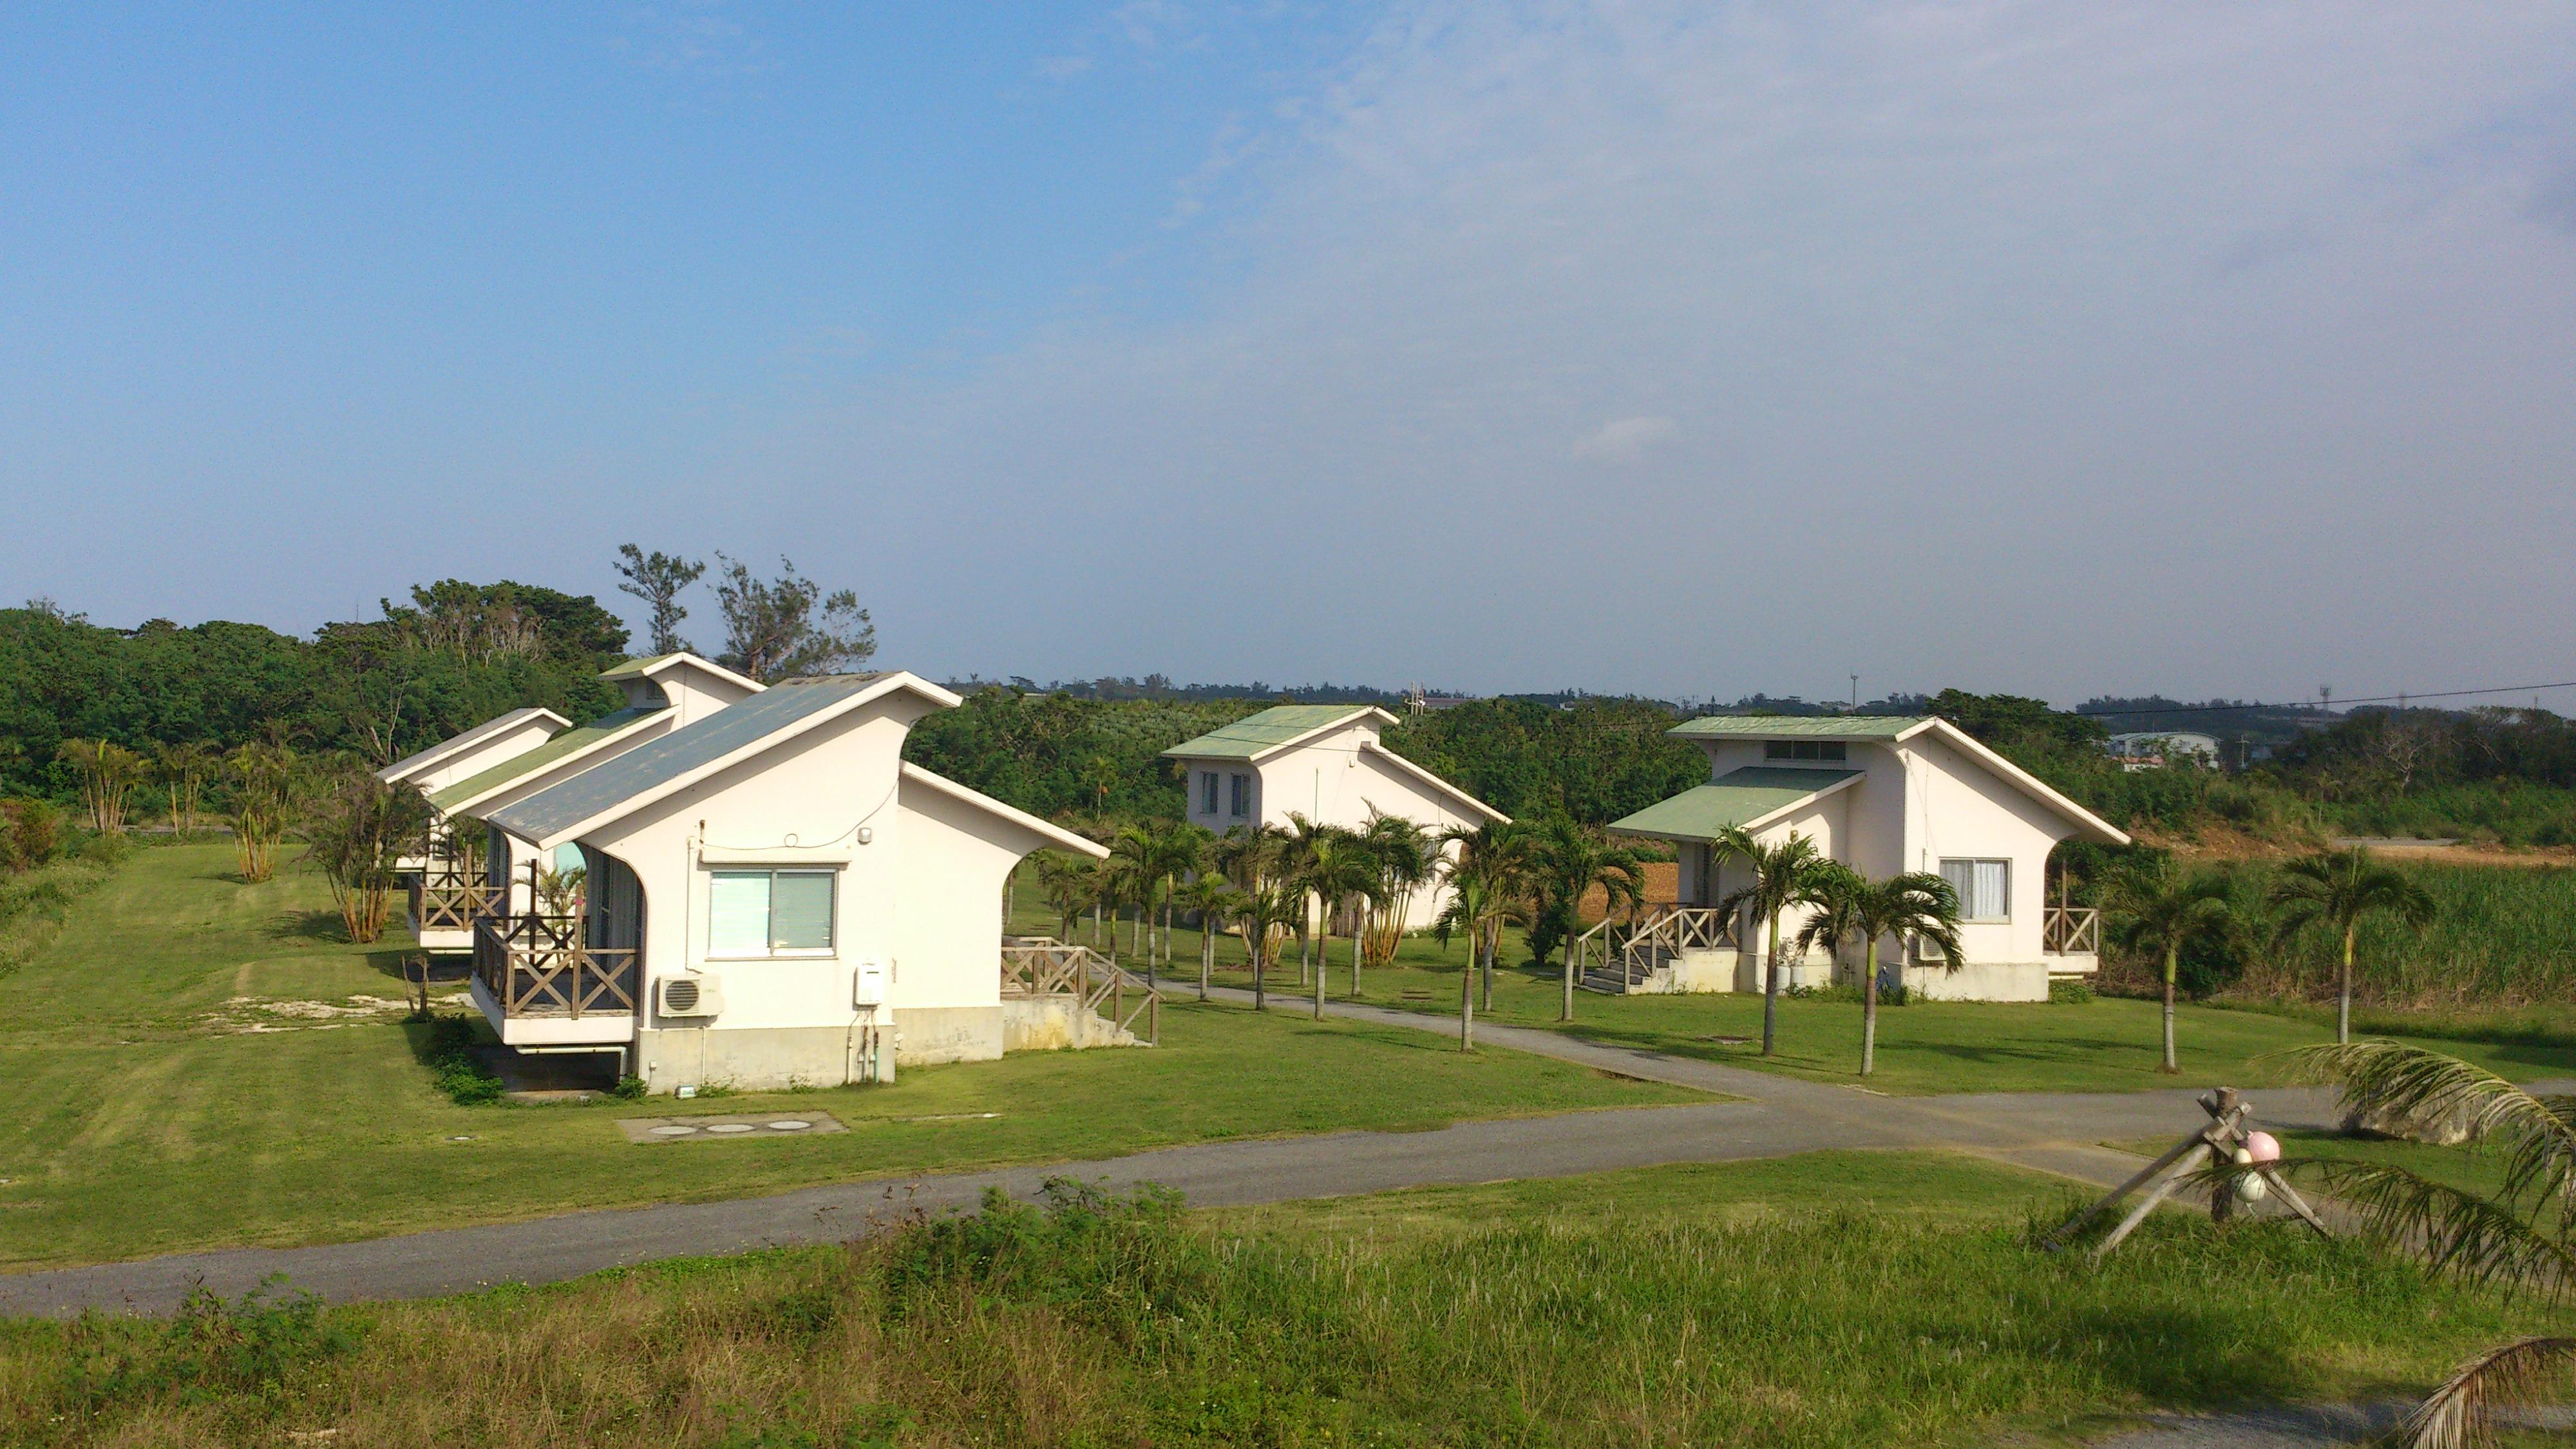 Minshuku Camp Mura